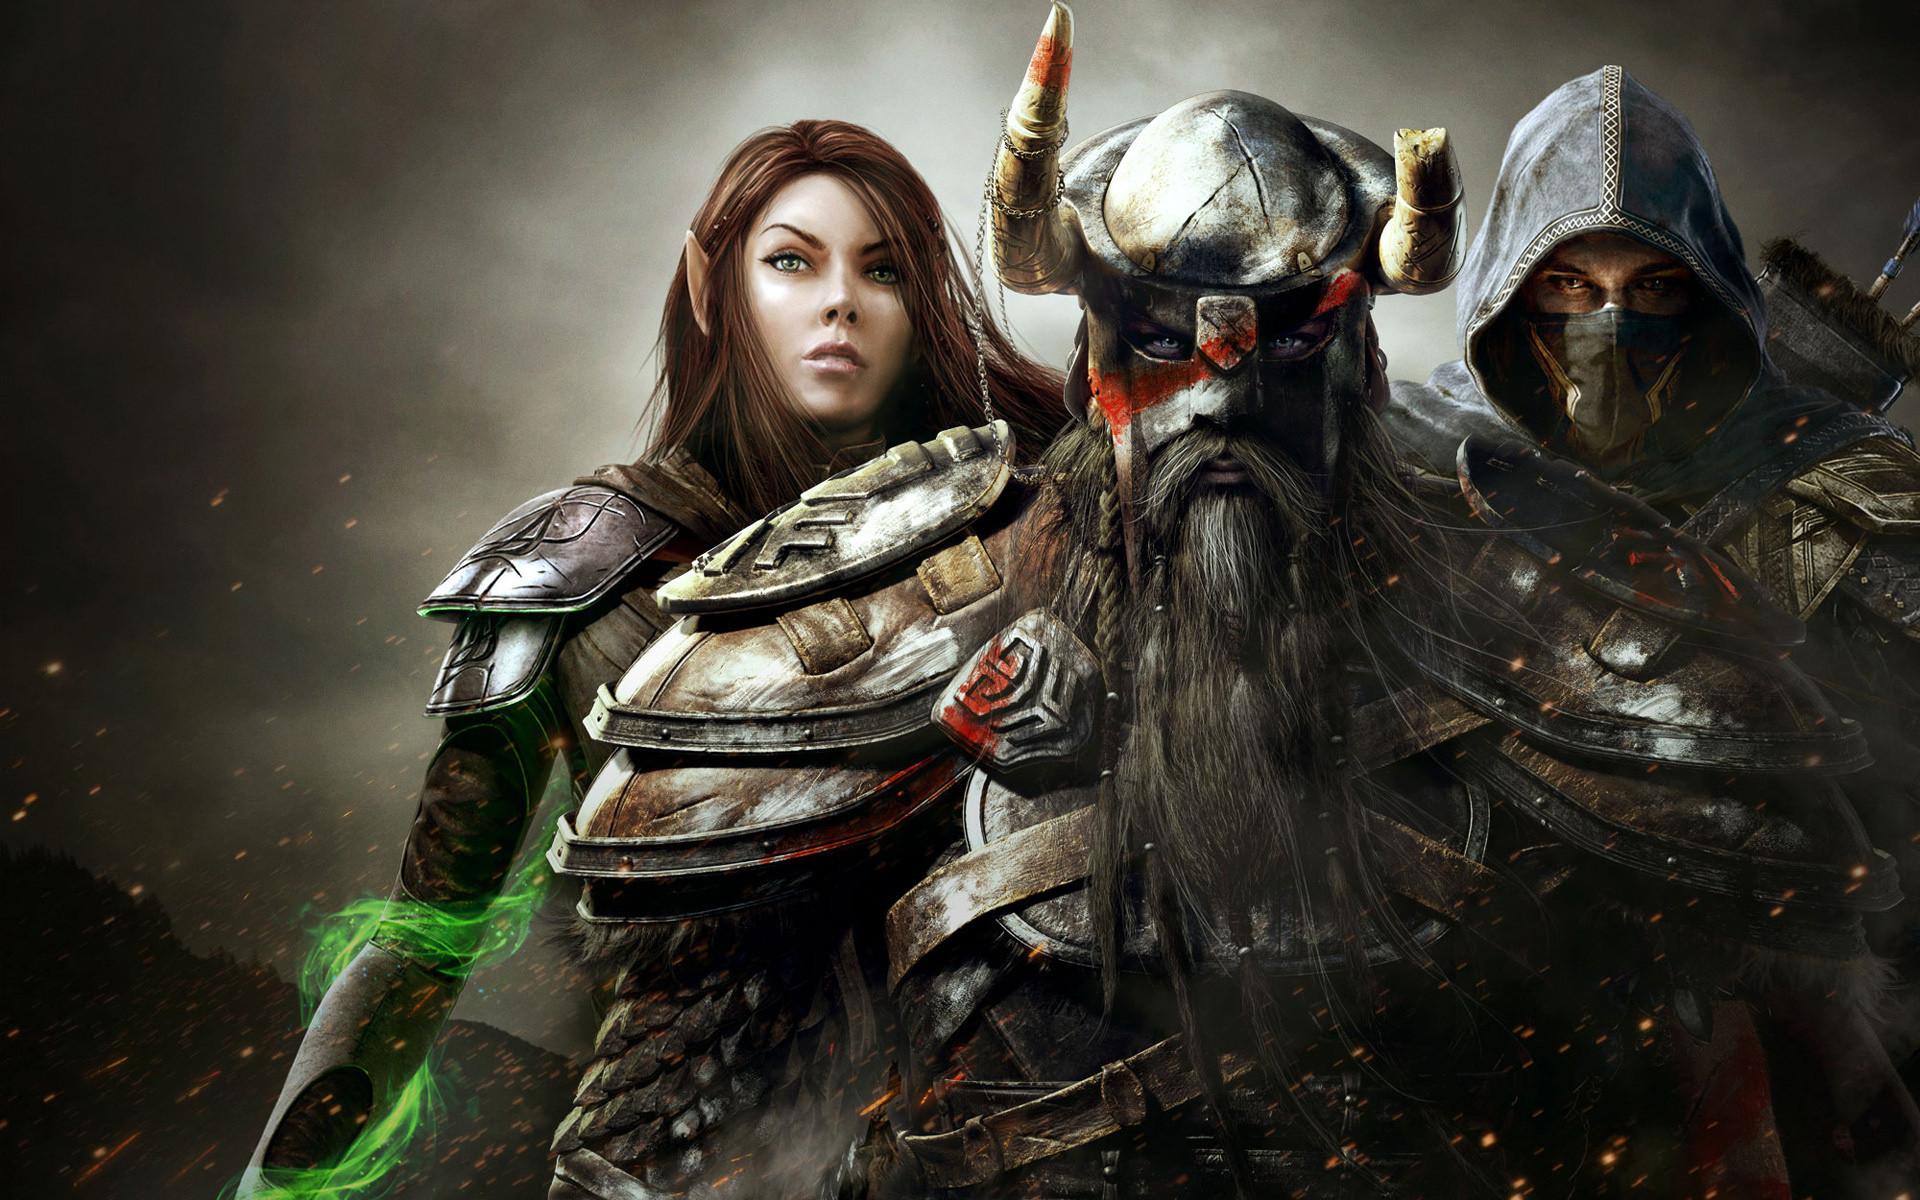 Explore The Elder Scrolls, Elder Scrolls Skyrim and more!